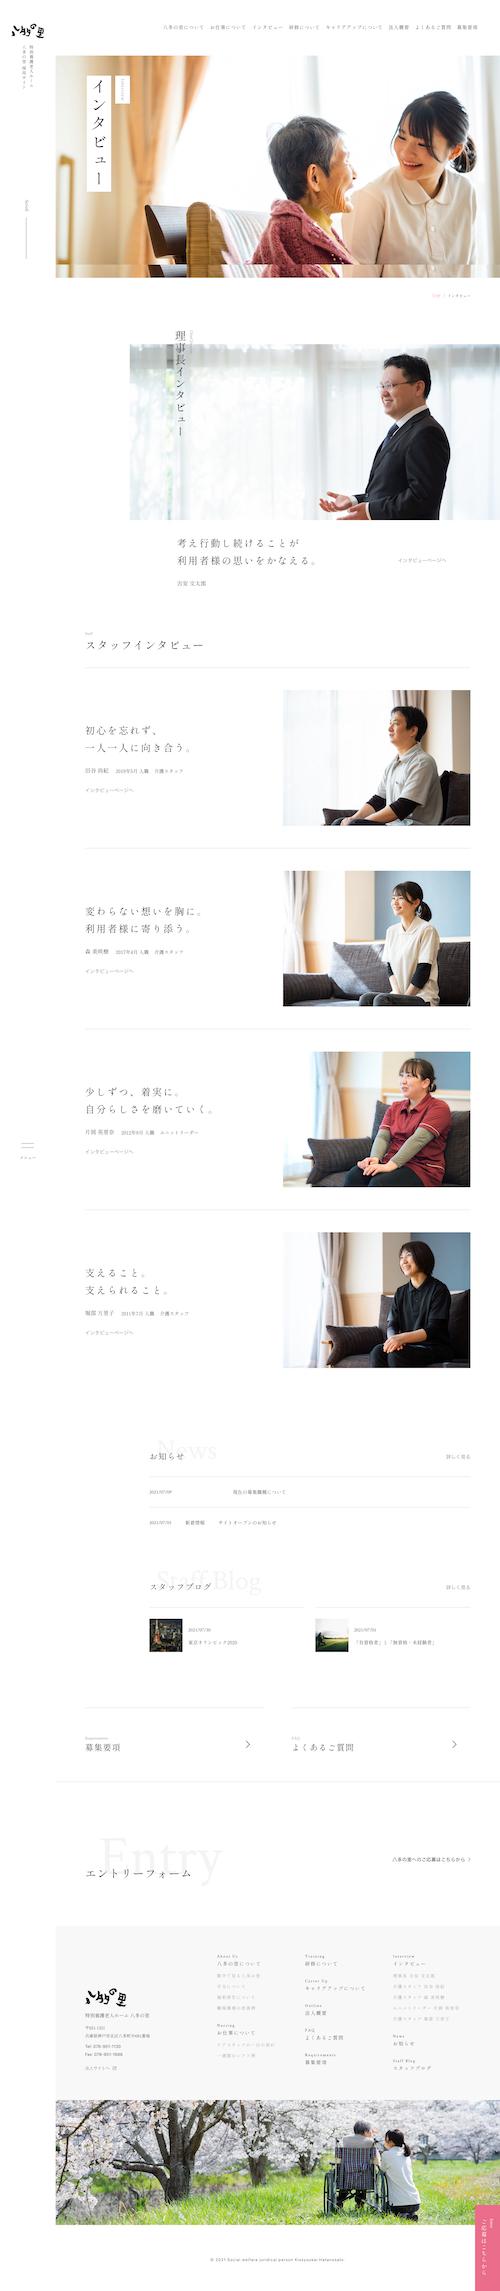 hatanosato-recruit-interview